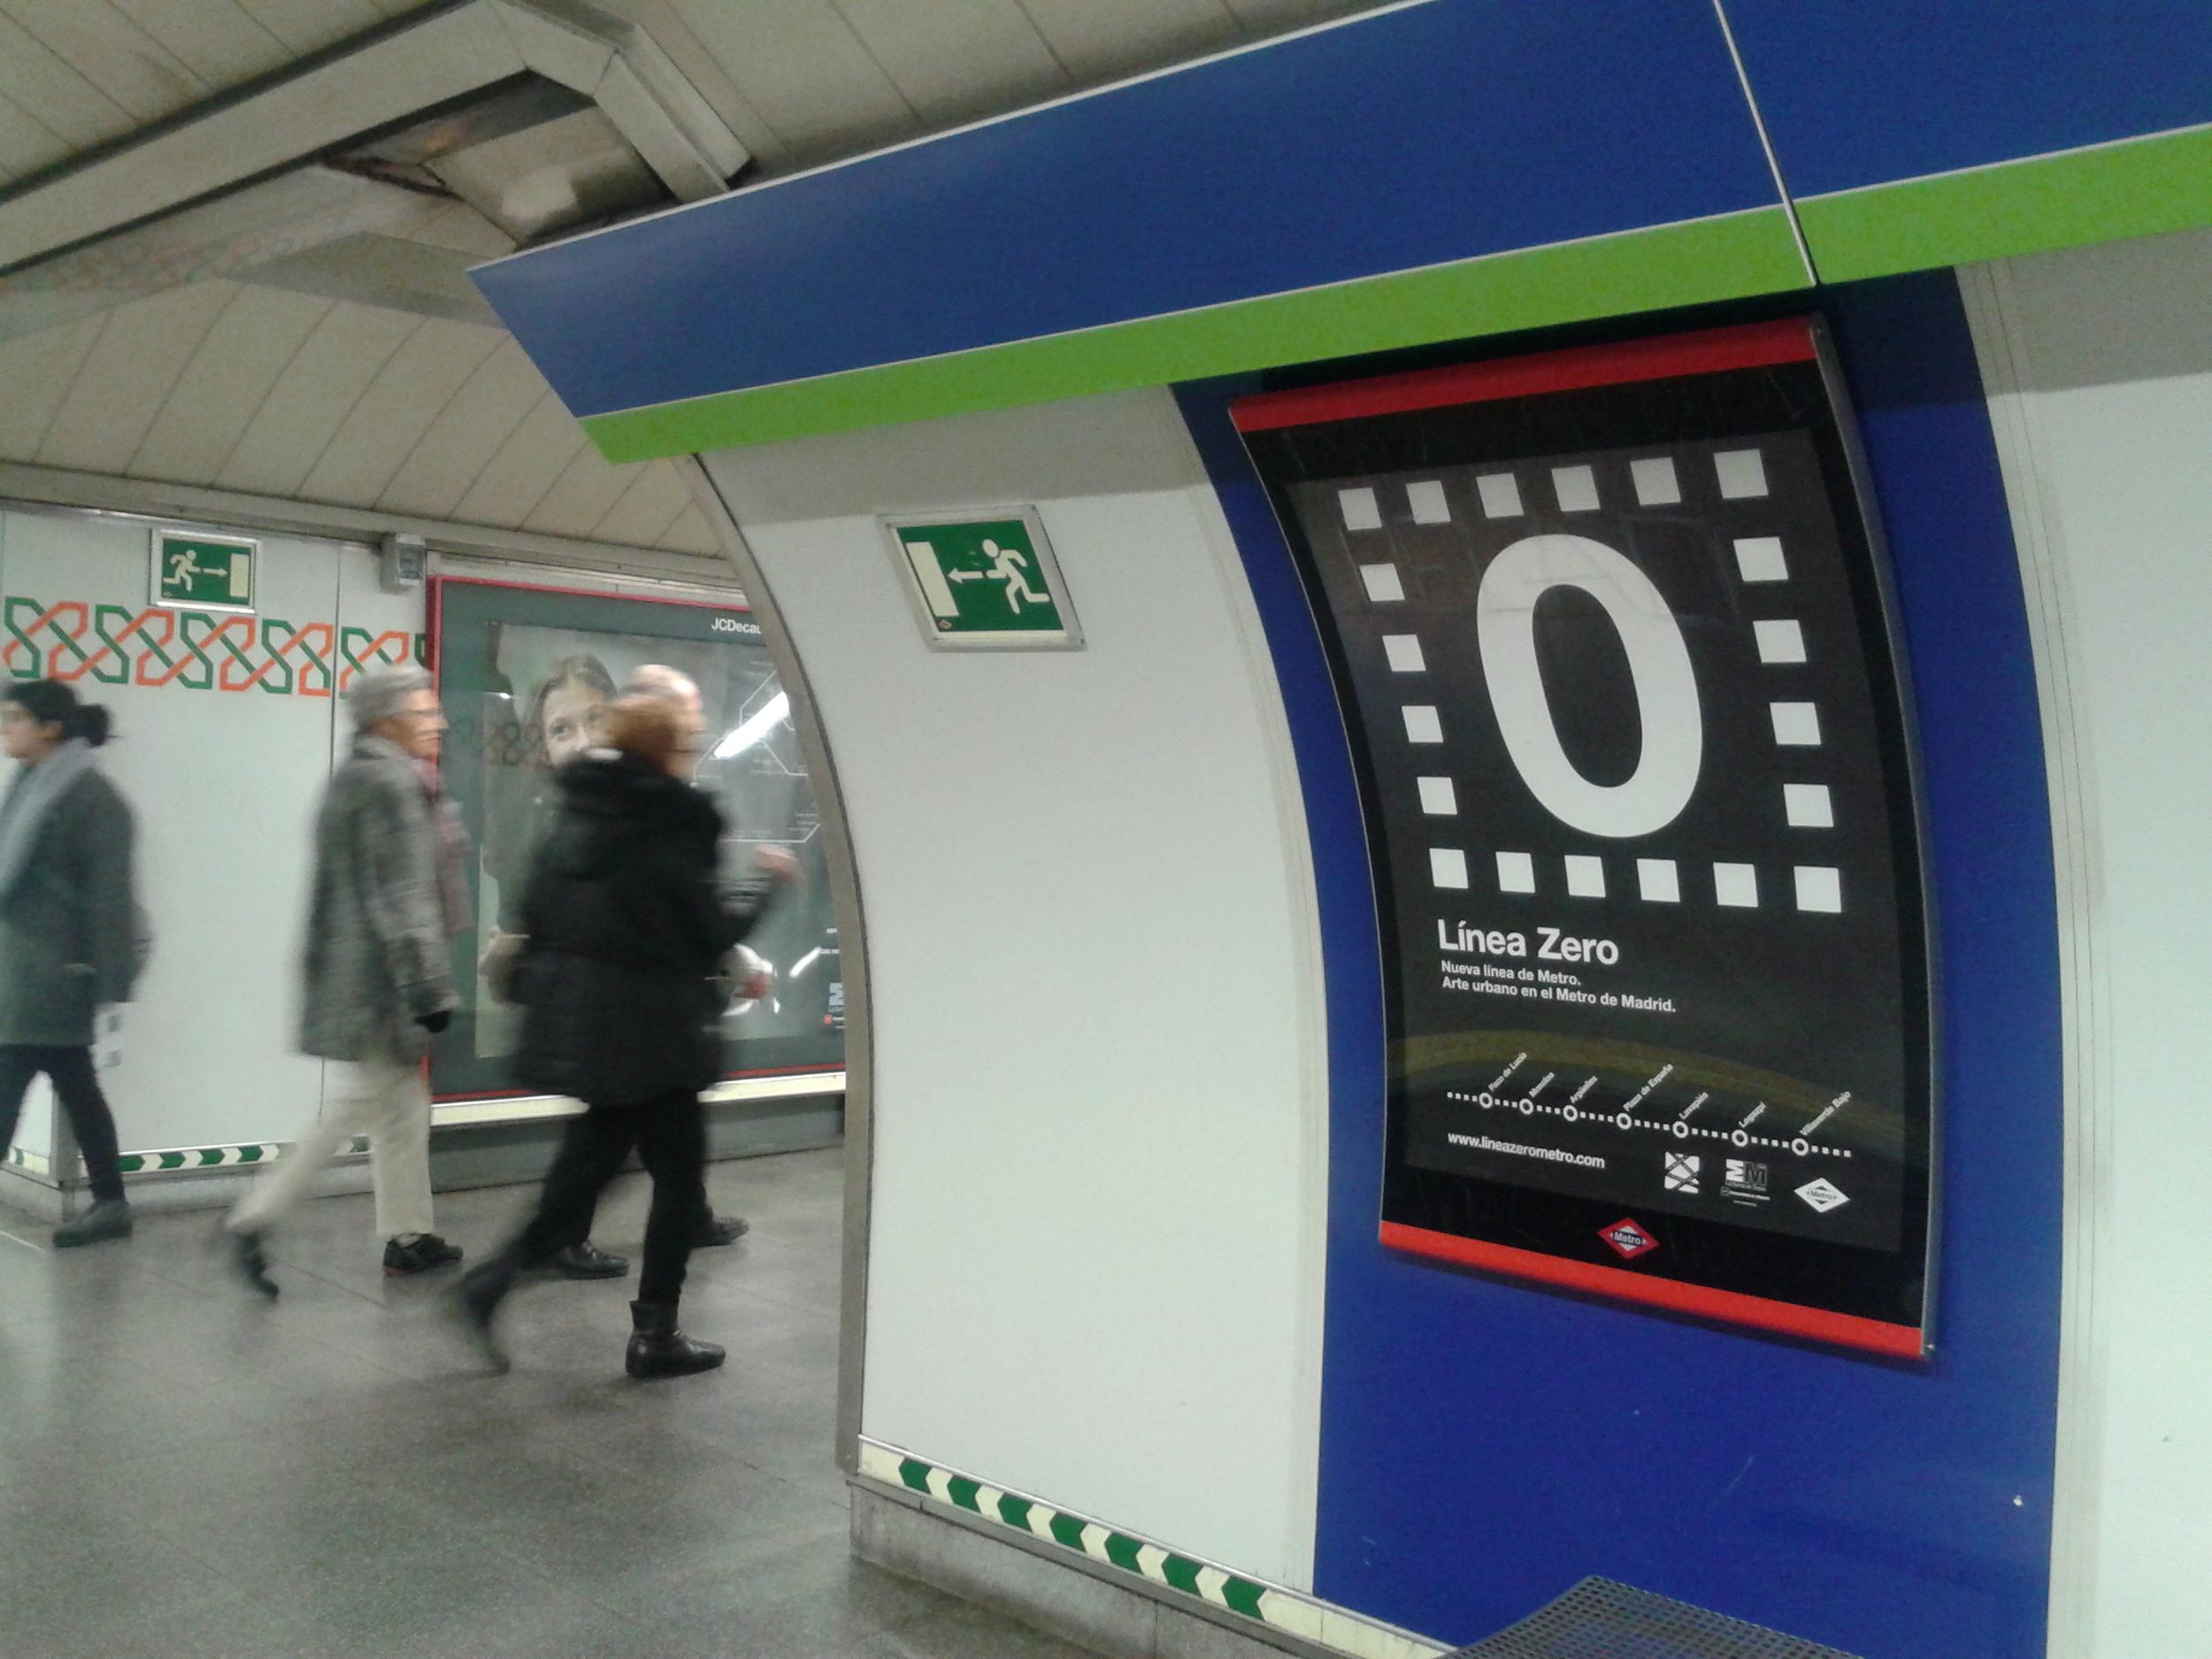 carteles en metro 1.jpg